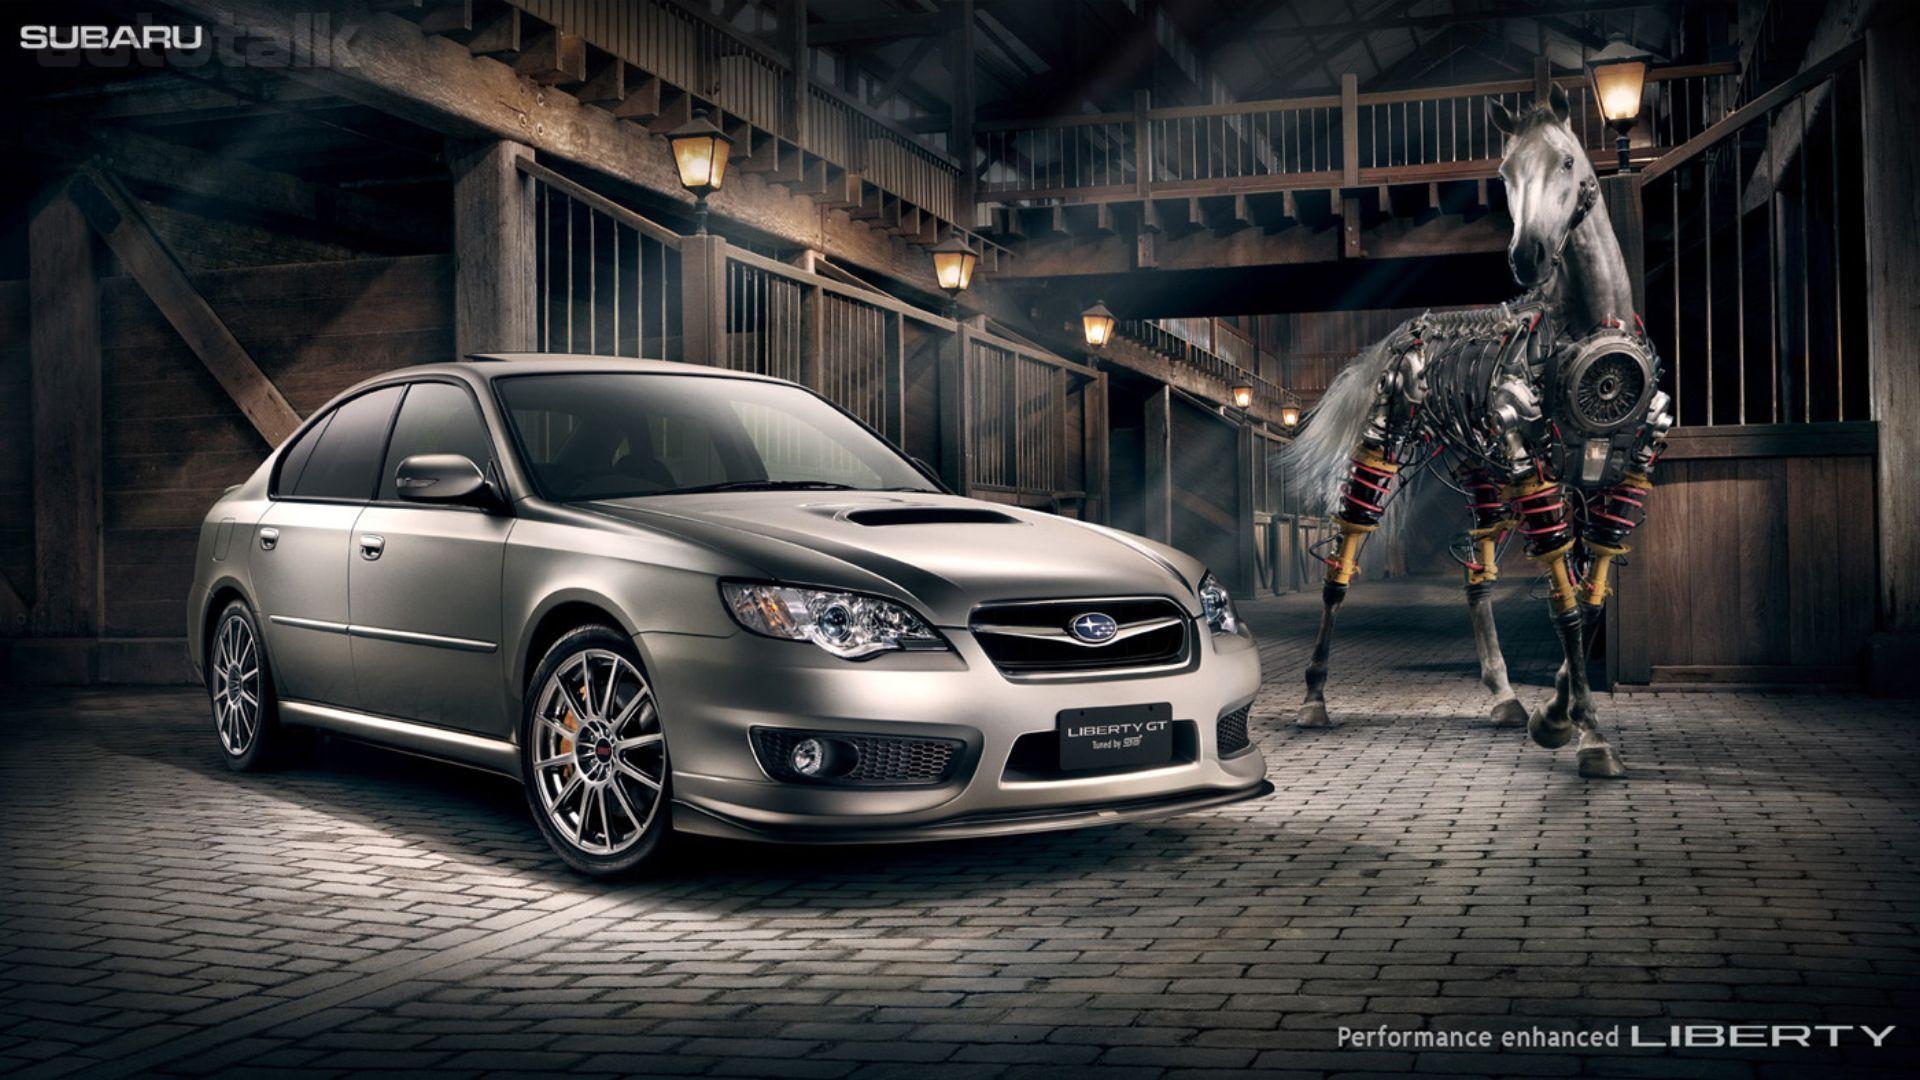 Subaru Liberty GT Wallpaper